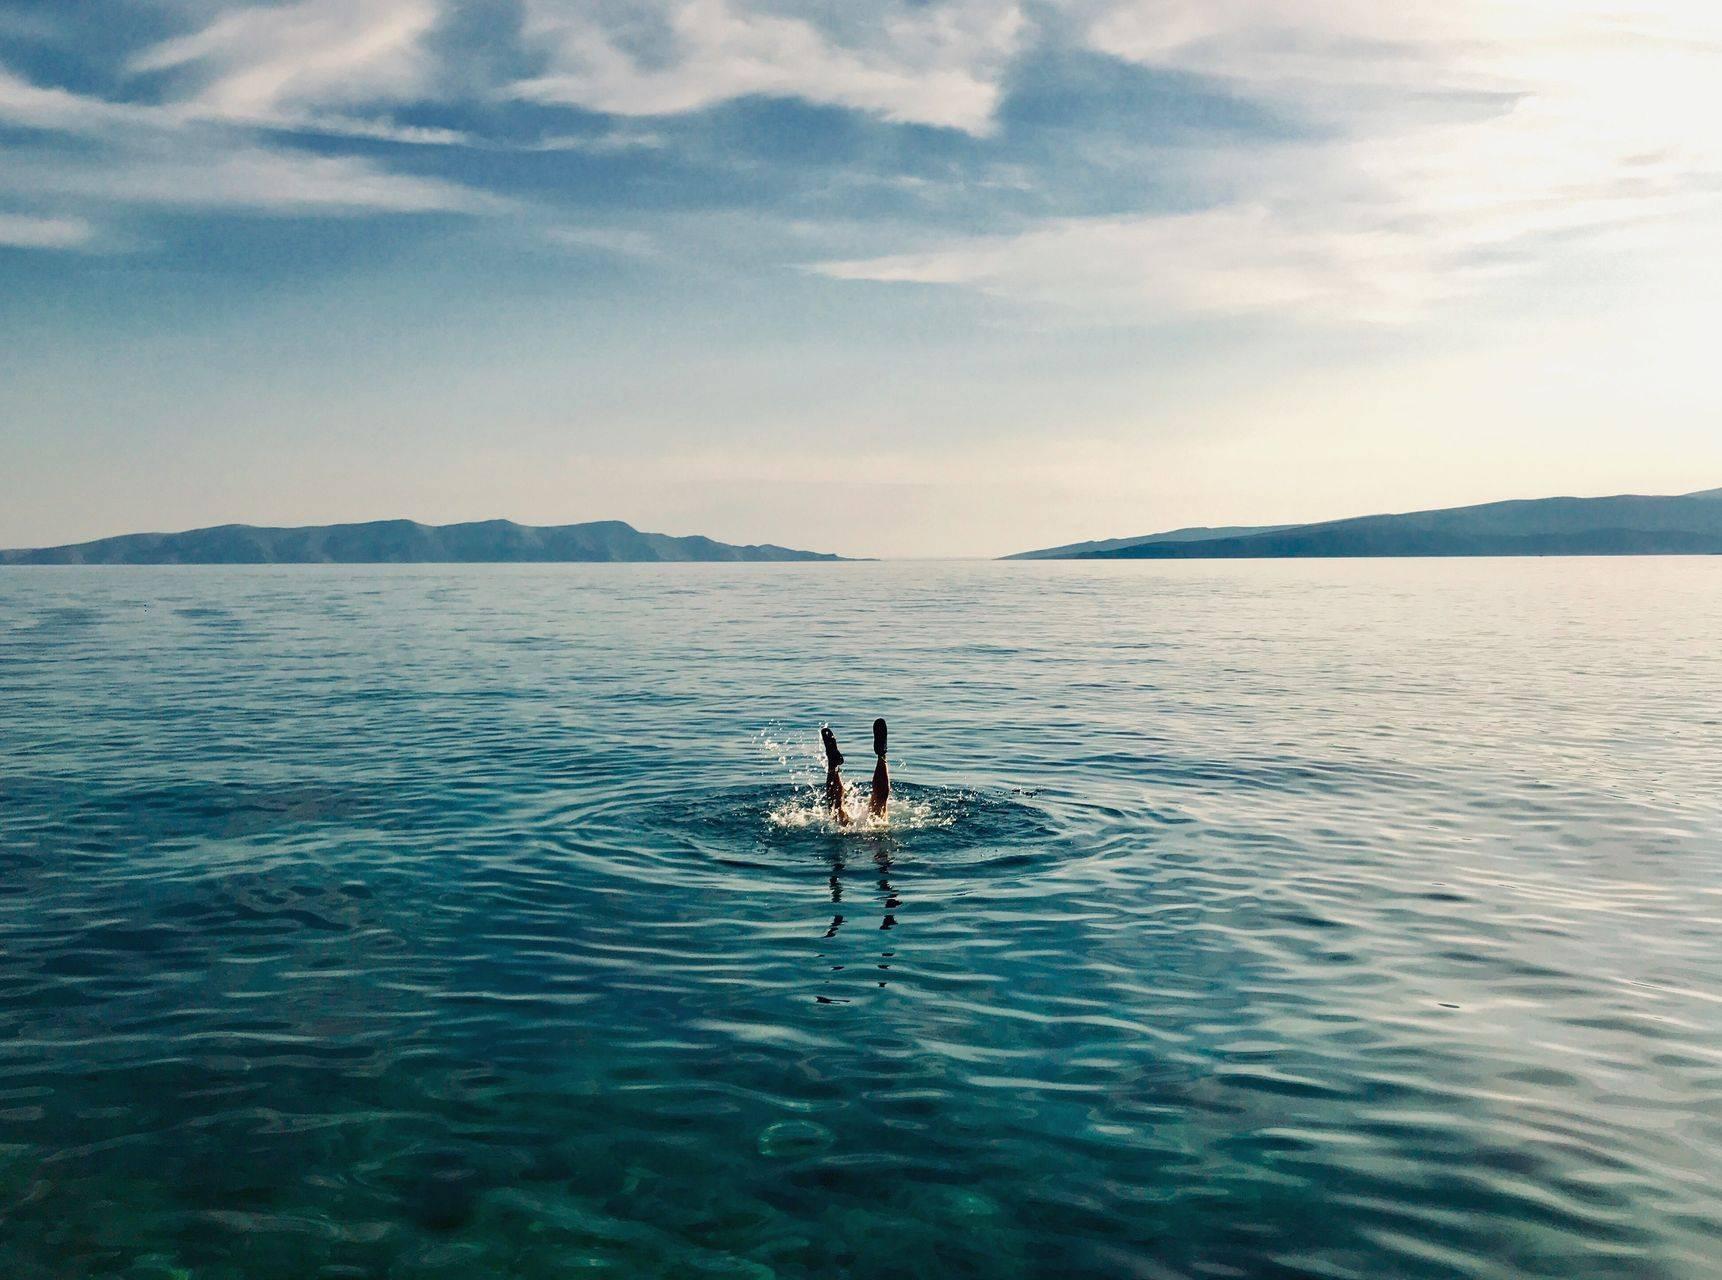 Relaxing waters